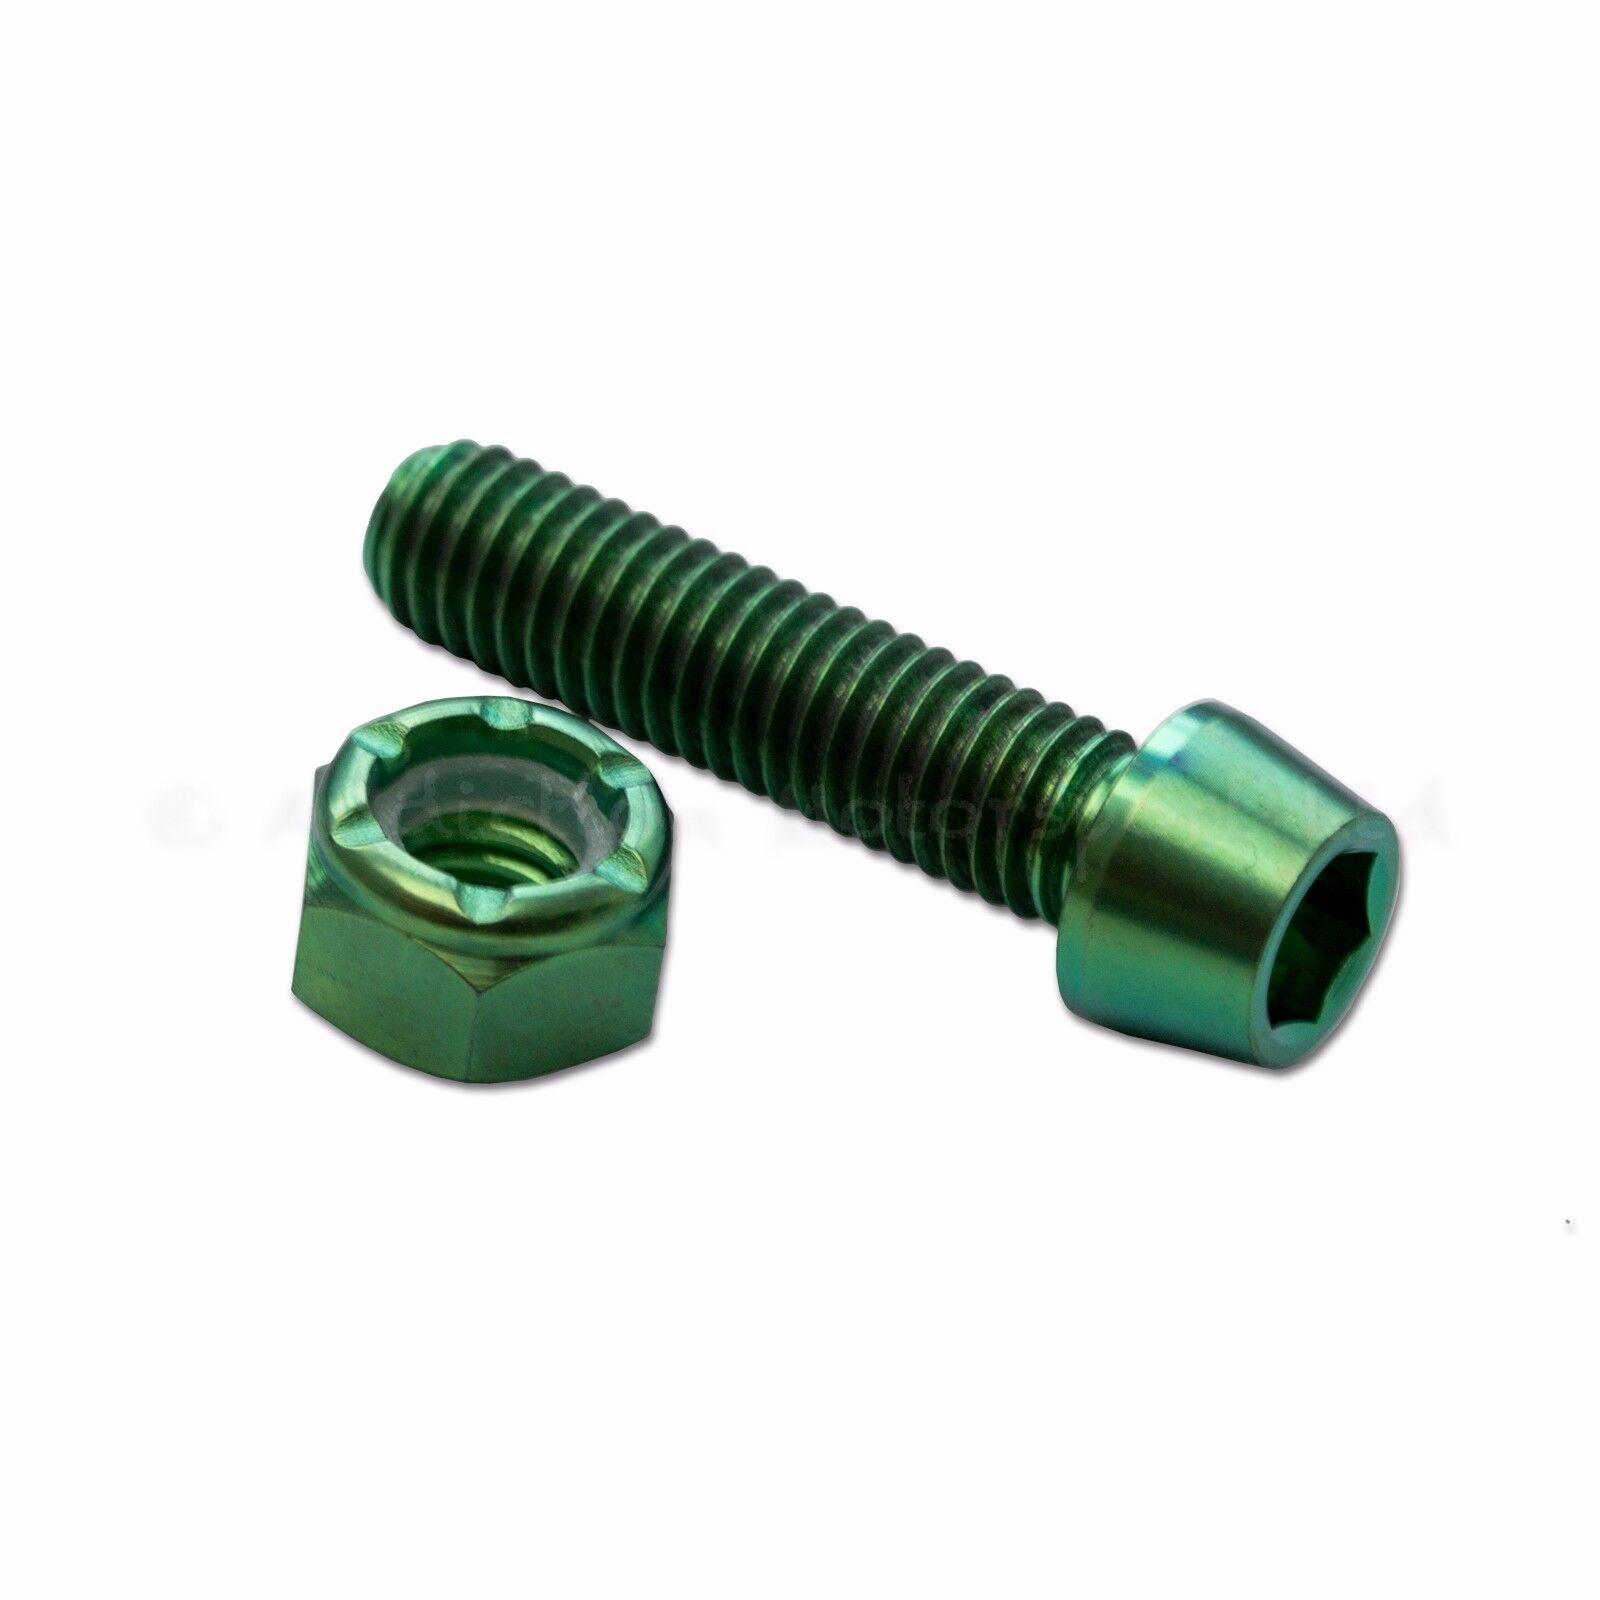 19RCS 16RCS 15RCS Brembo Brake Master Cylinder Black Titanium Lever Screw Nut